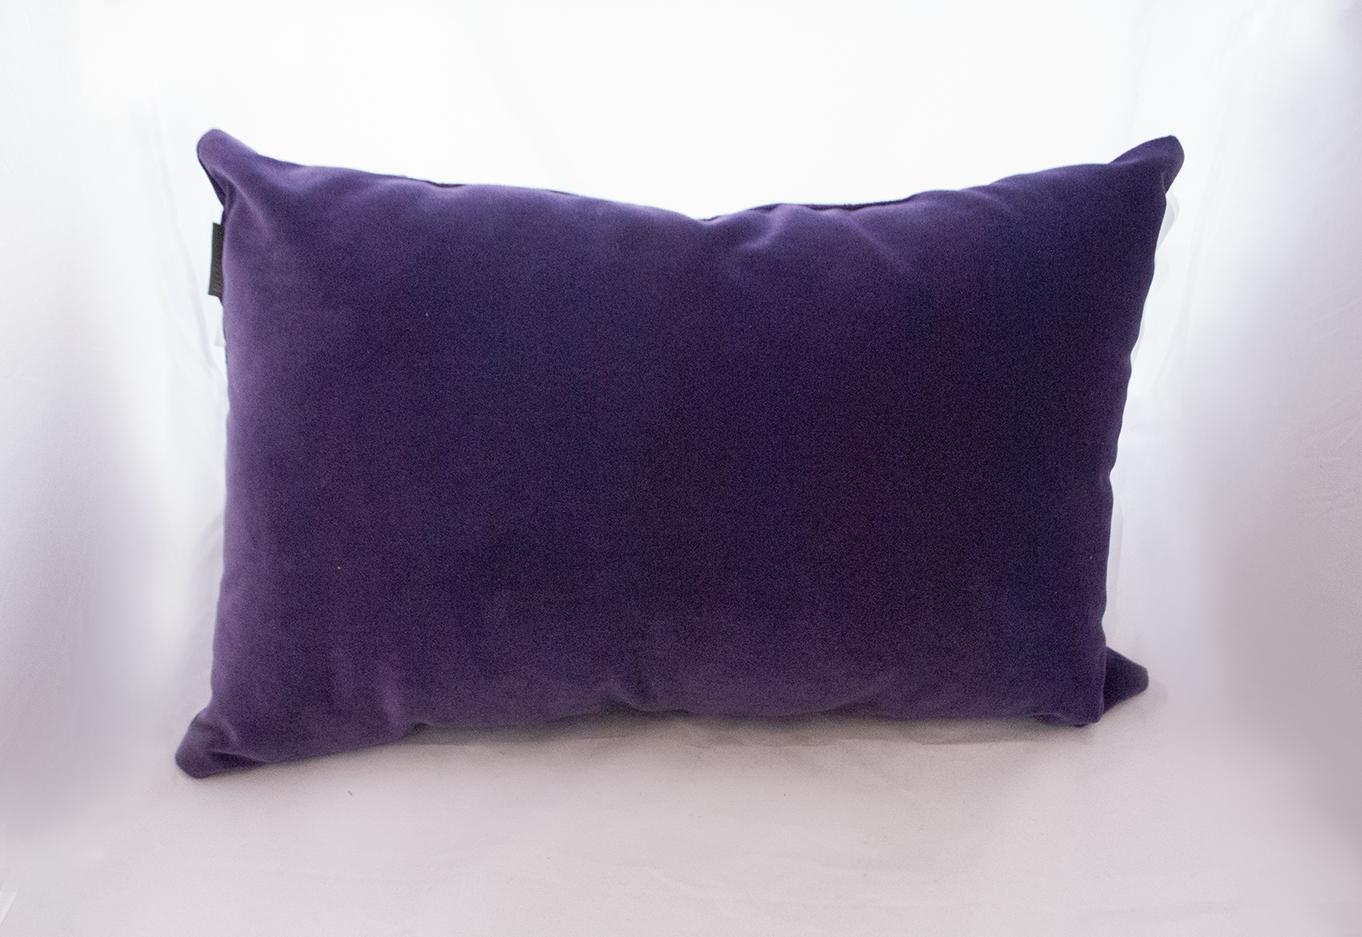 royal purple pillow   Quantity: 2  Price: $10.00